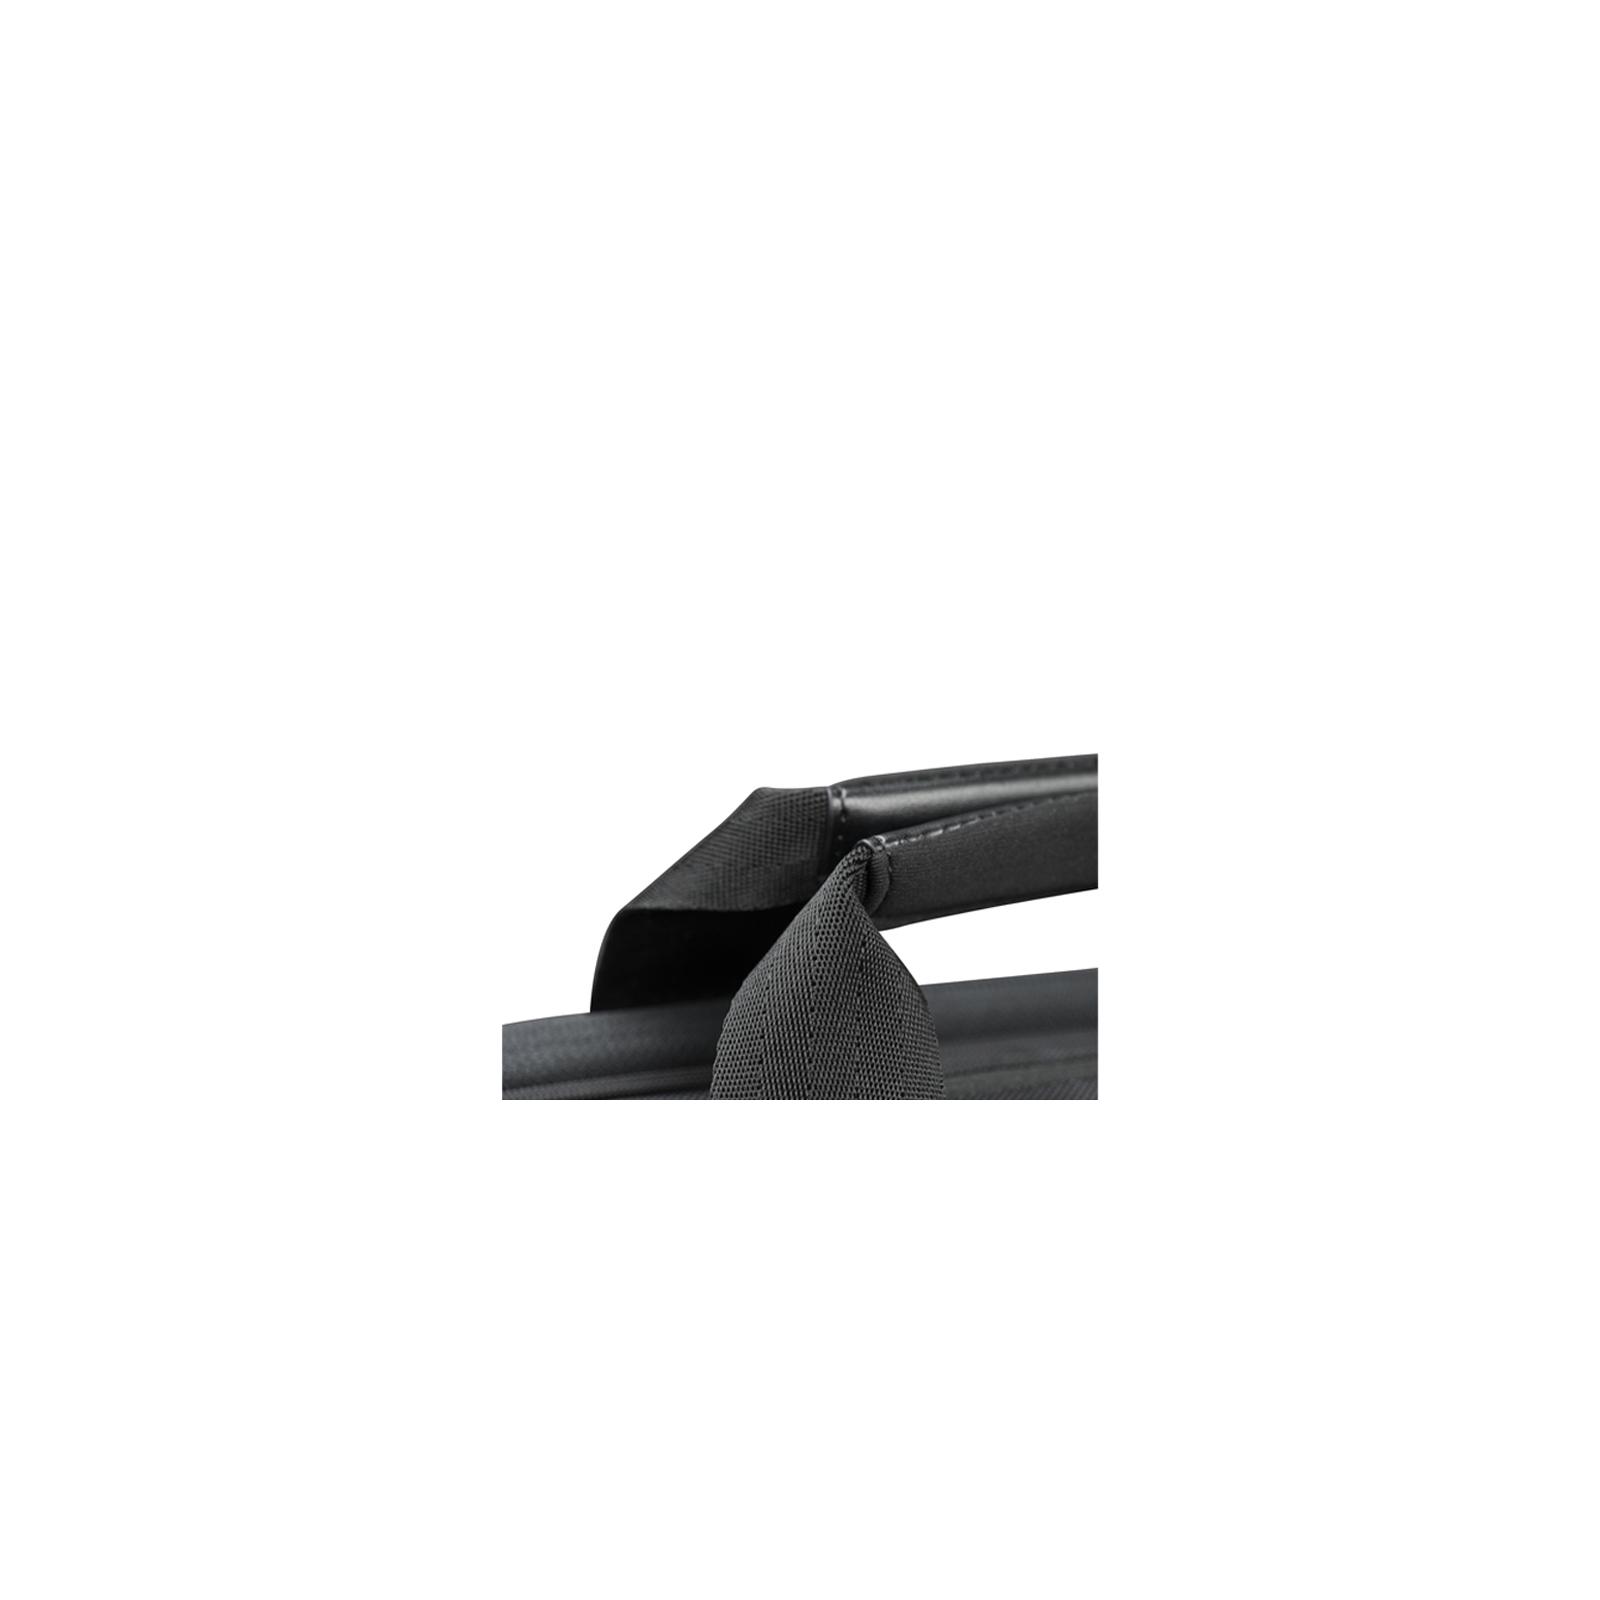 "Сумка для ноутбука Dell 15.6"" Topload (460-BBLR) изображение 6"